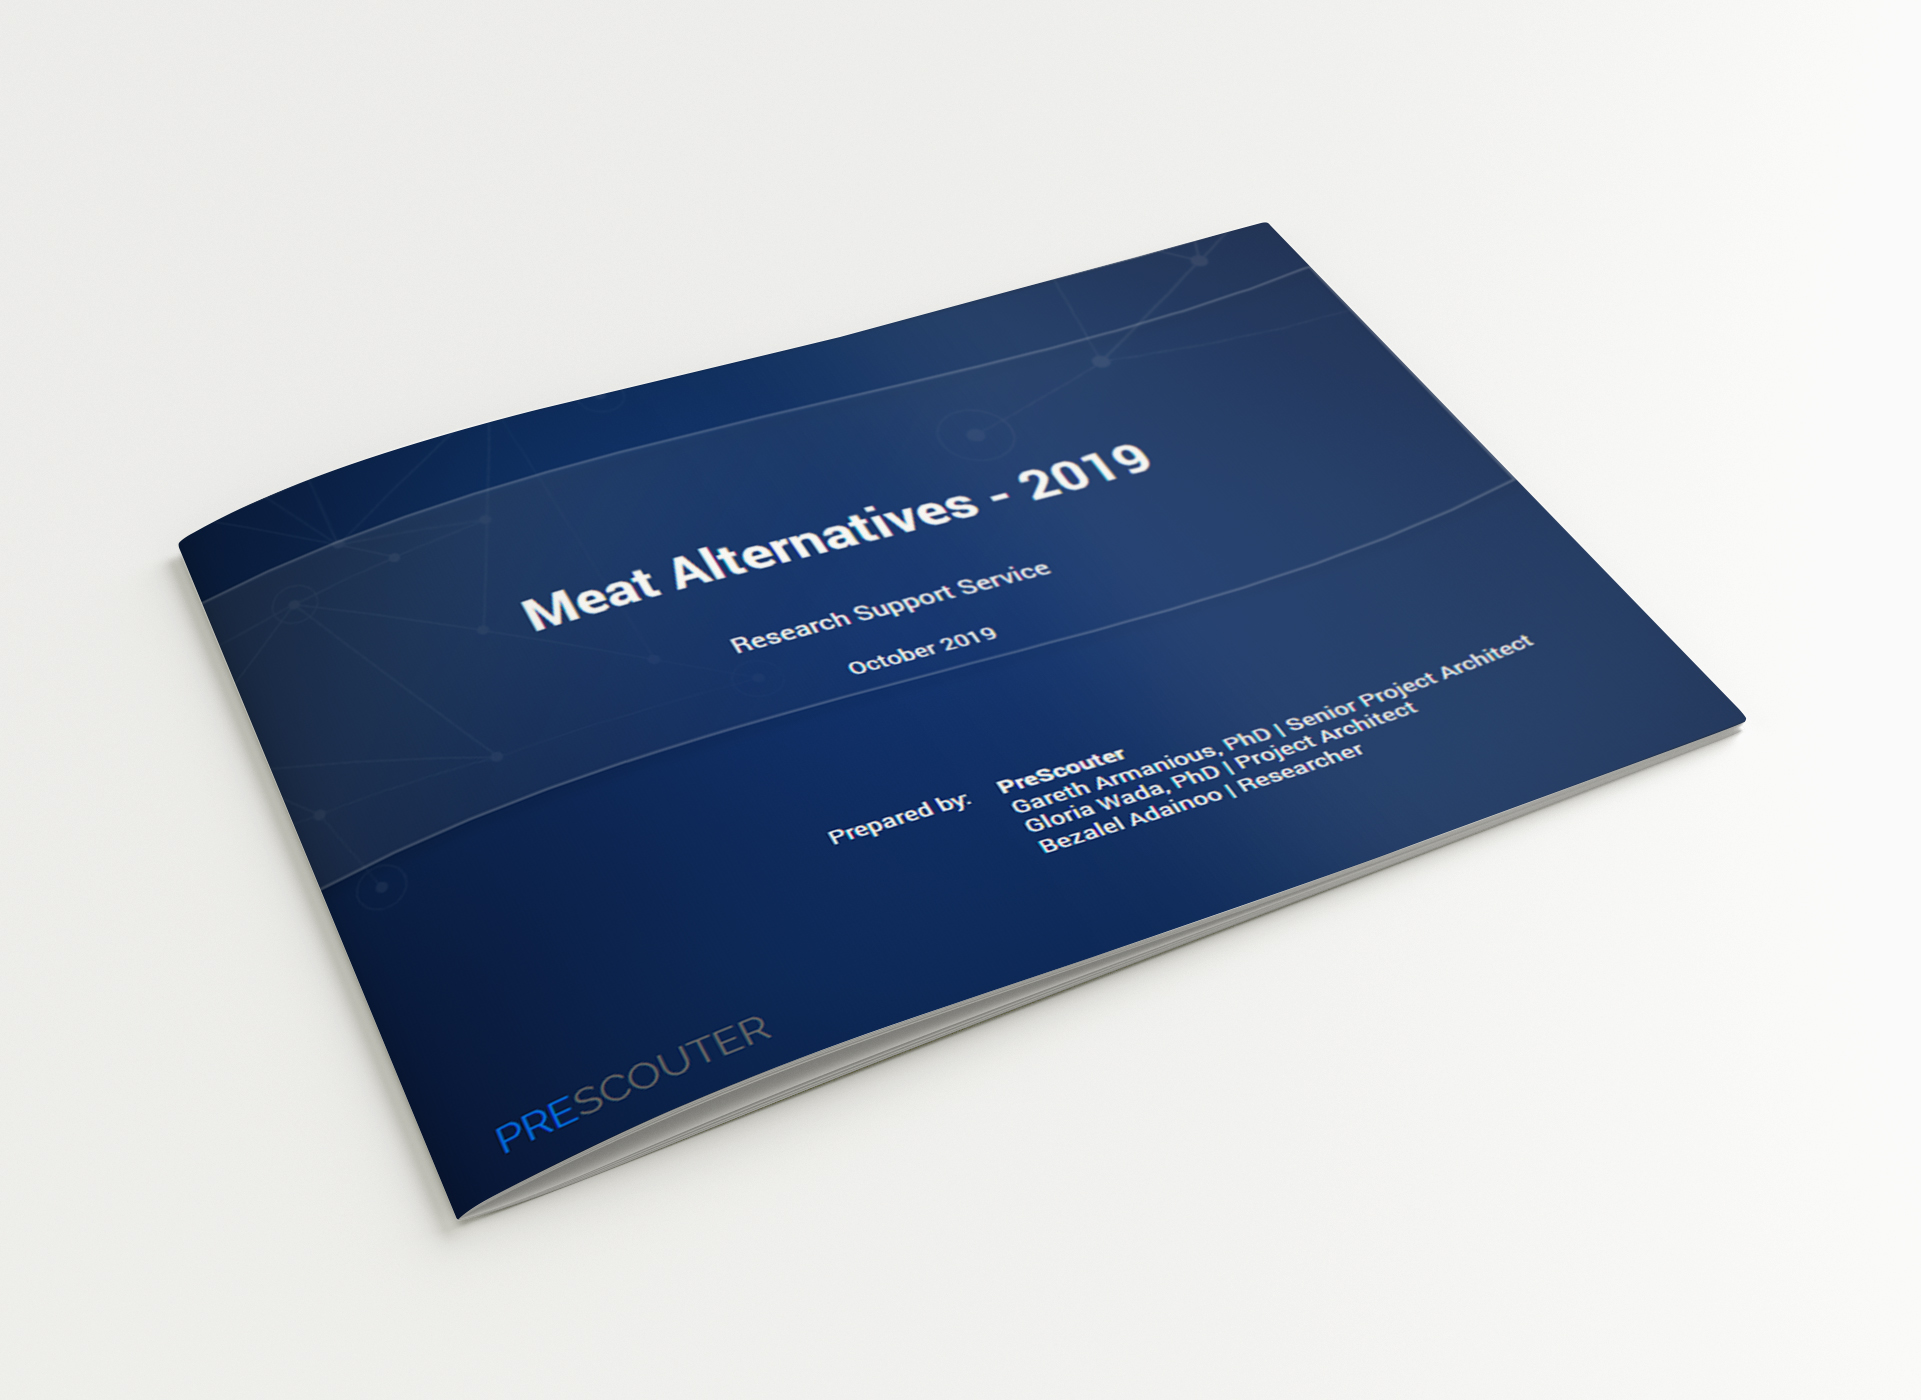 Meat Alternatives – 2019